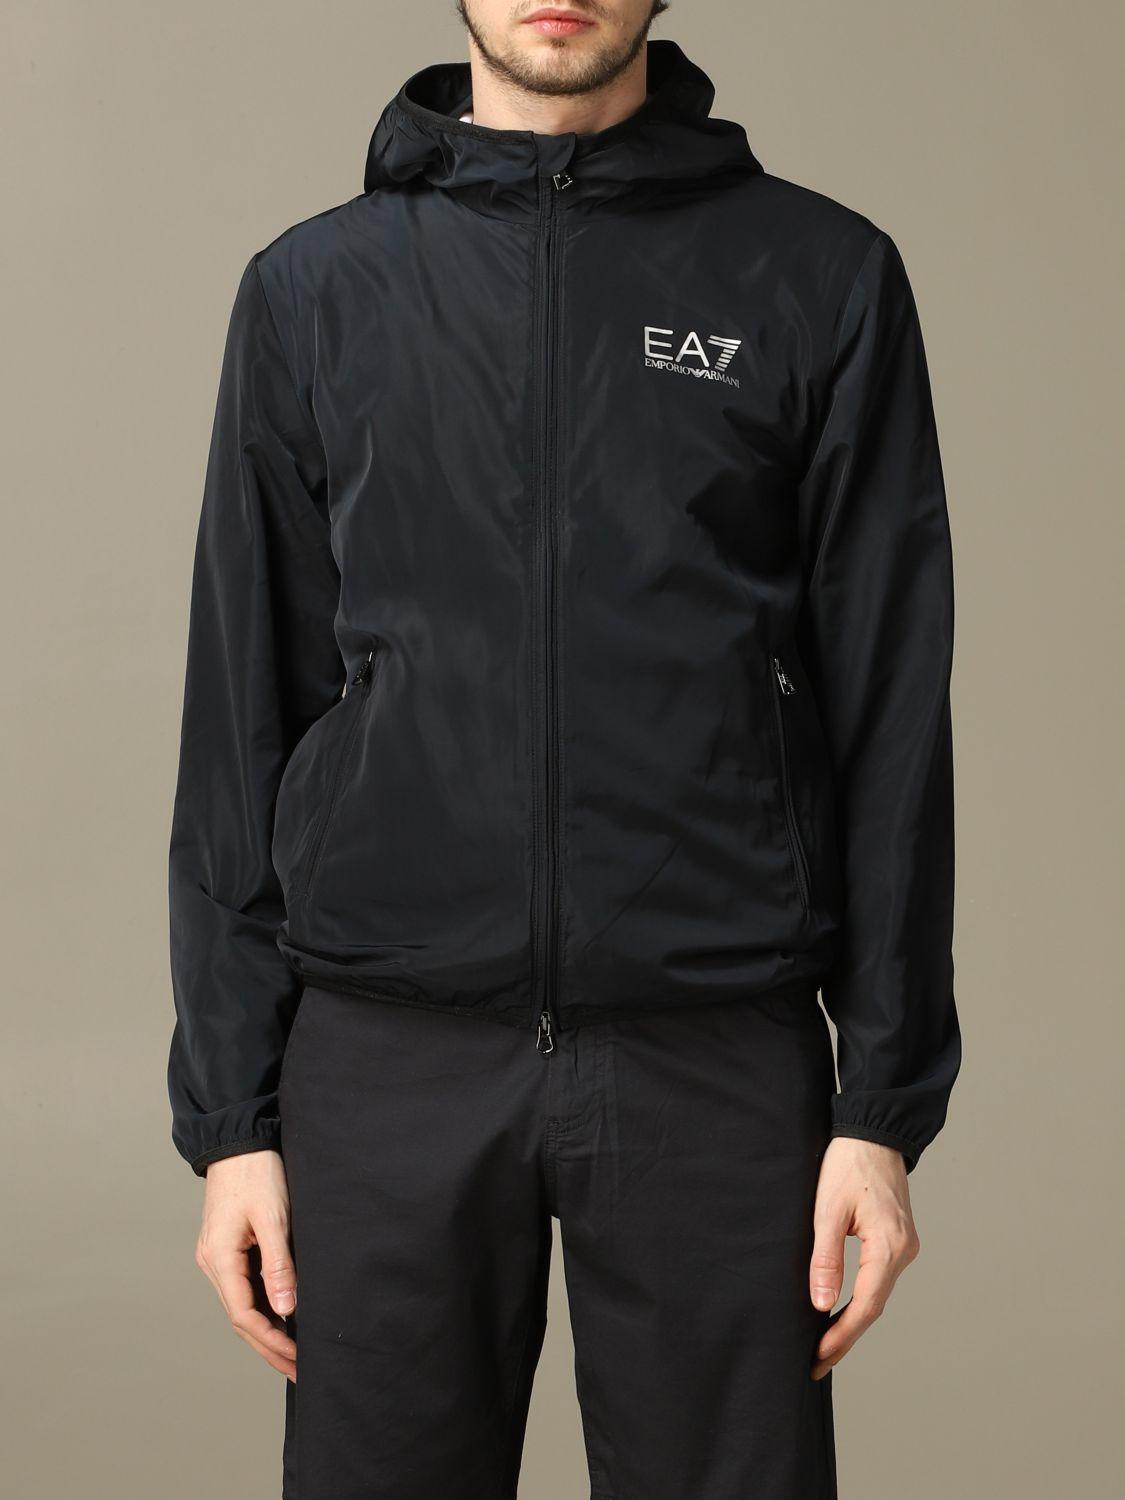 Coat Ea7: Coat men Ea7 navy 1